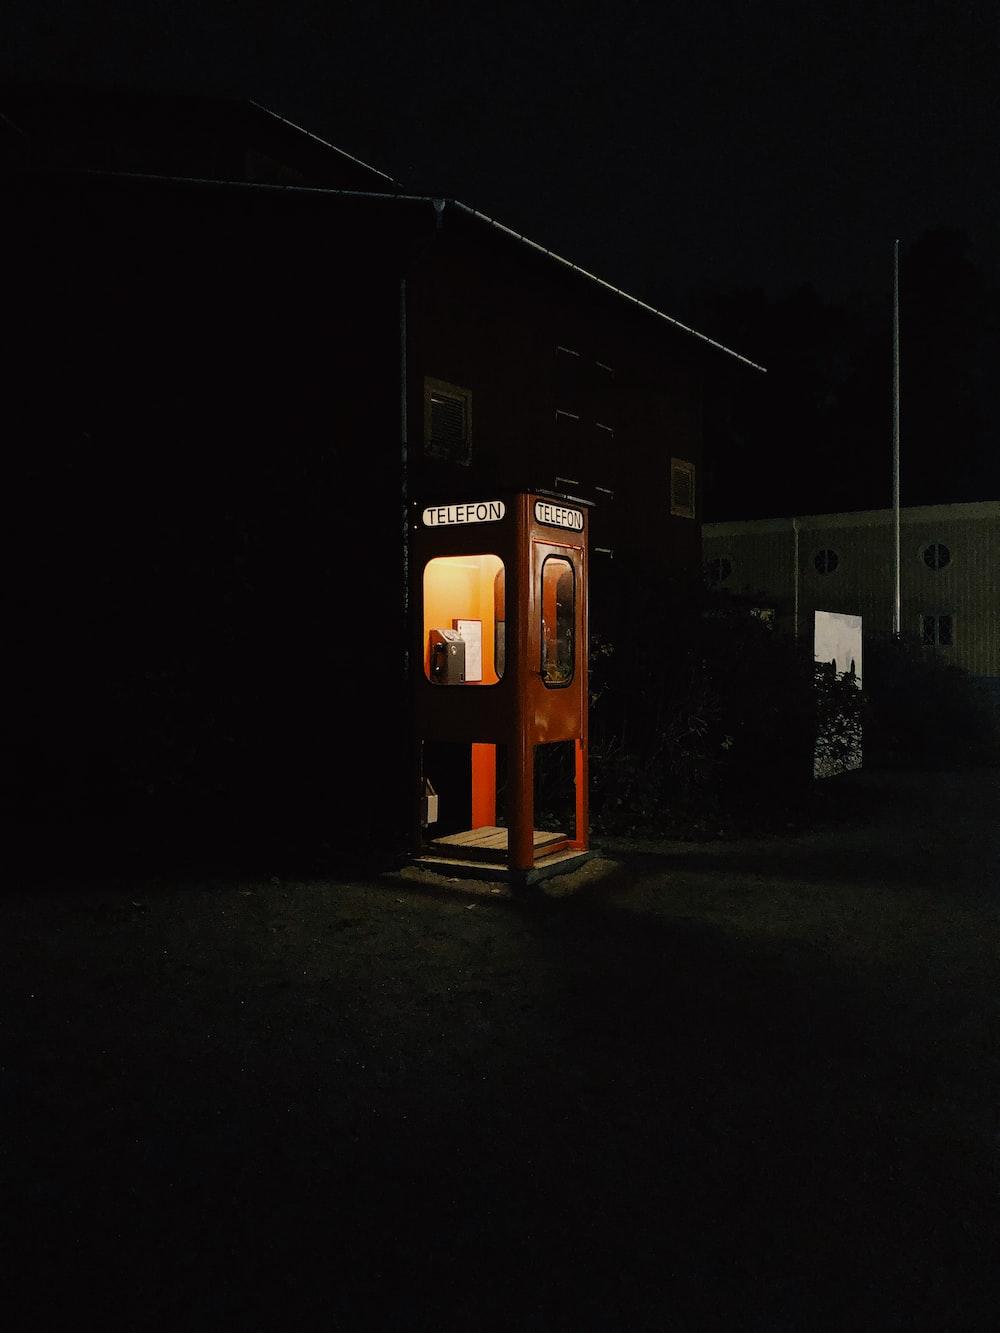 payphone at night